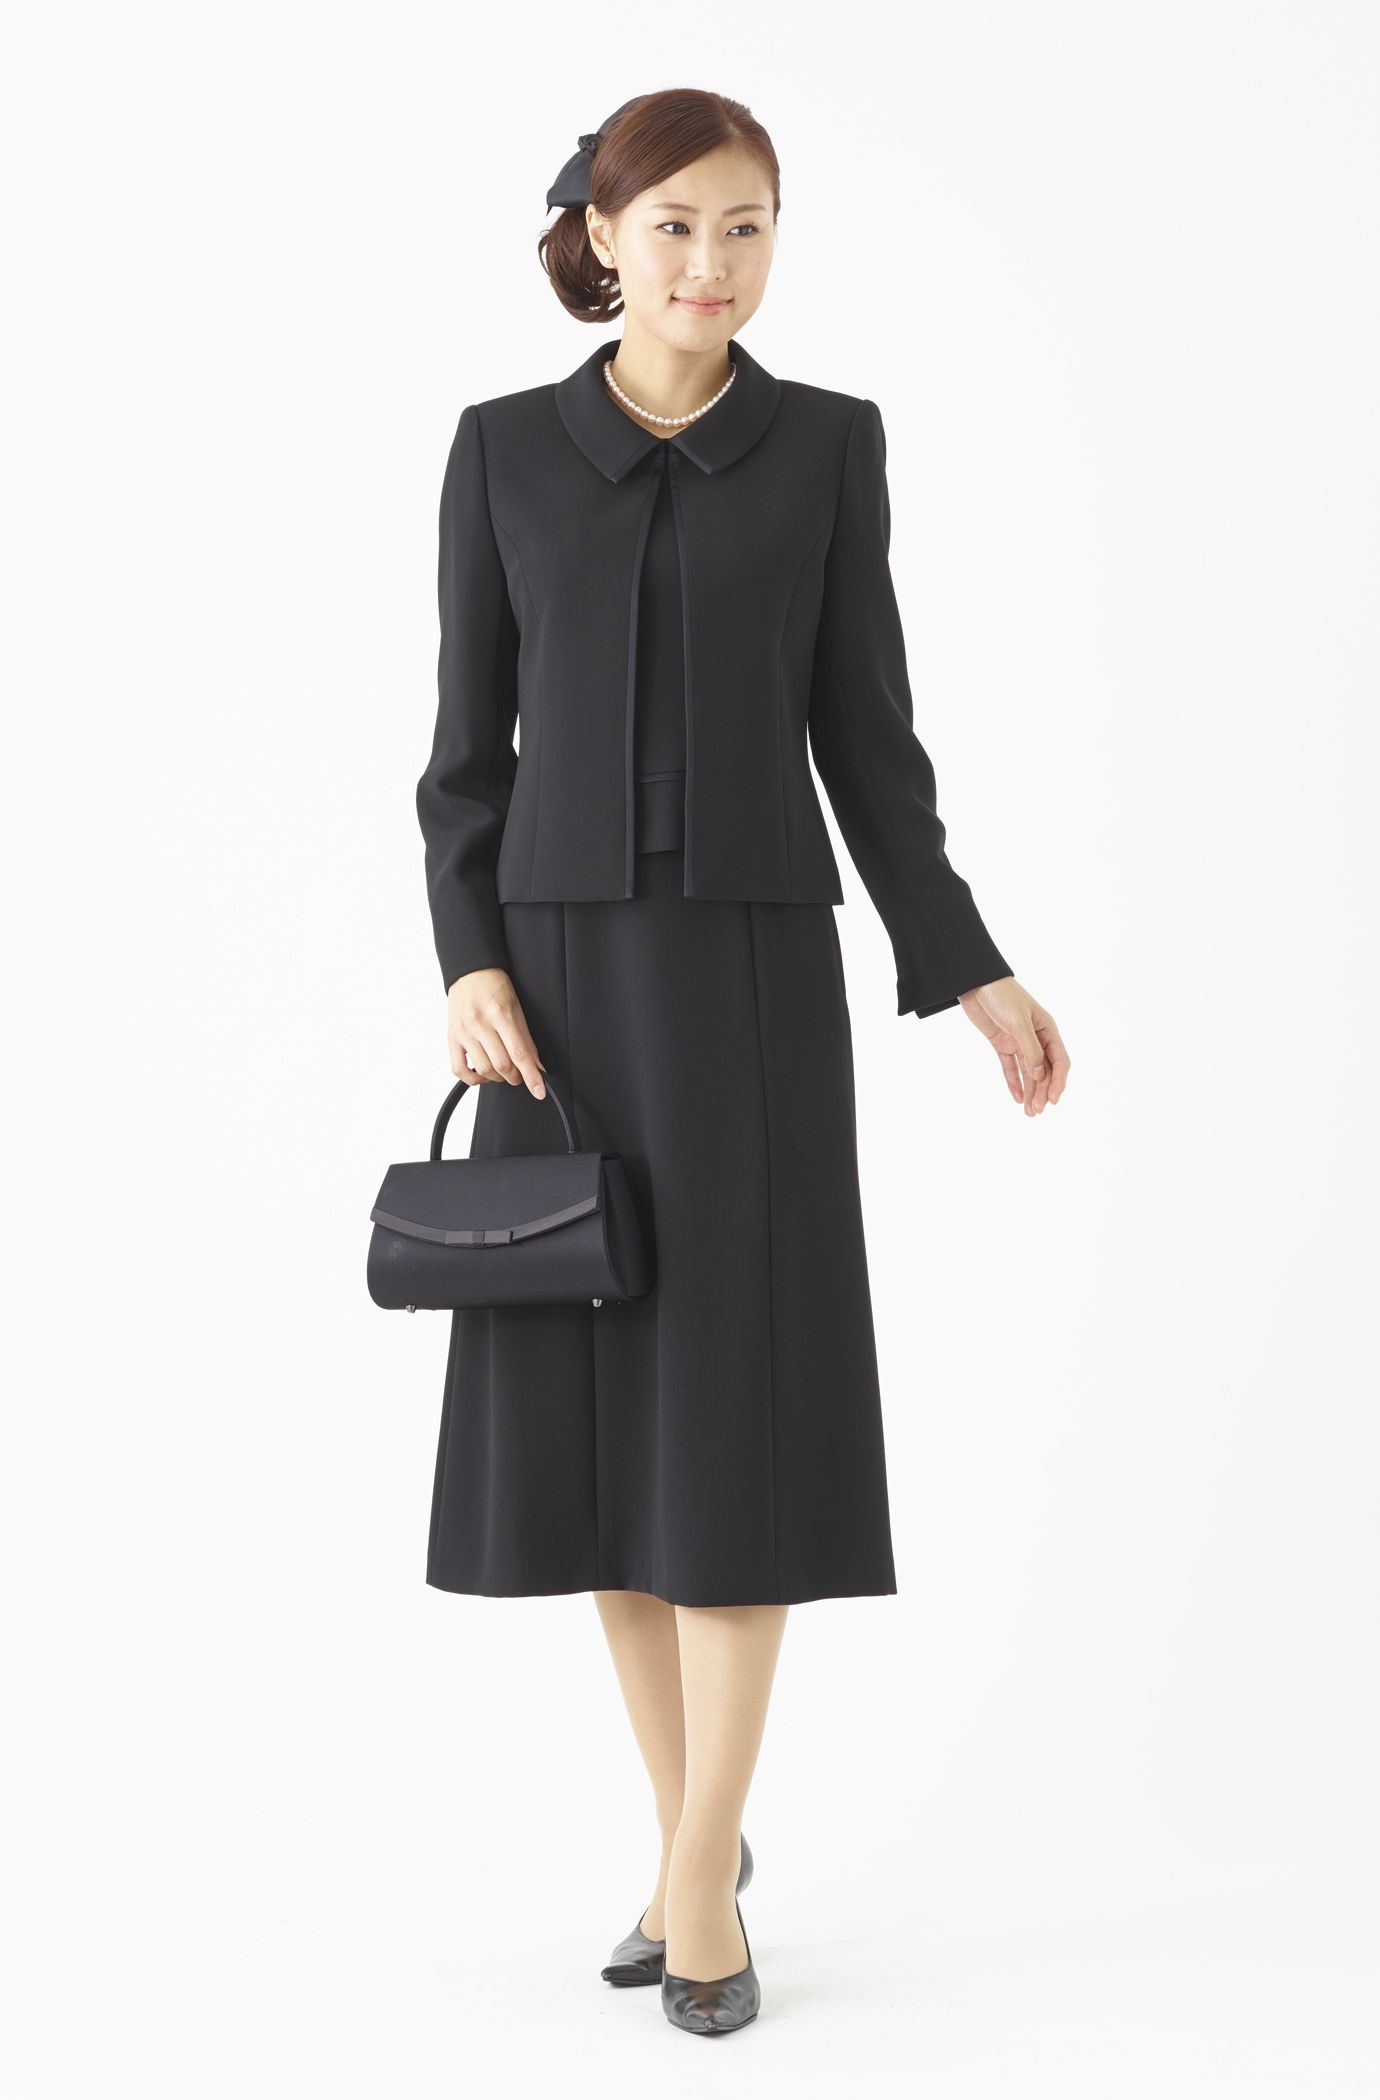 da5b8a96e17ba7 3点セット ブラックフォーマル スーツ 喪服 女性 02W51680|MONOIR 喪服・礼服・ブラック